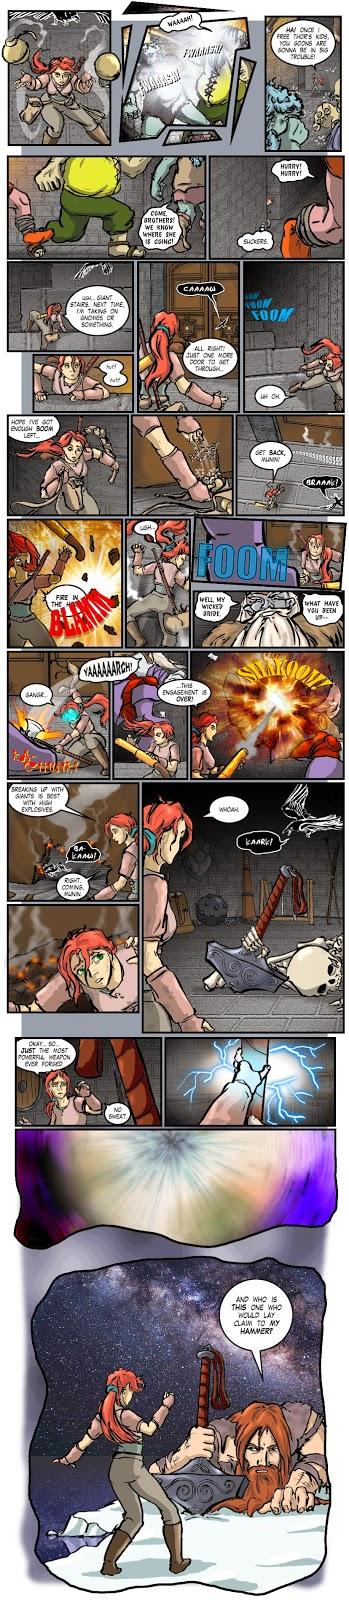 http://talesfromthevault.com/thunderstruck/comic697.html